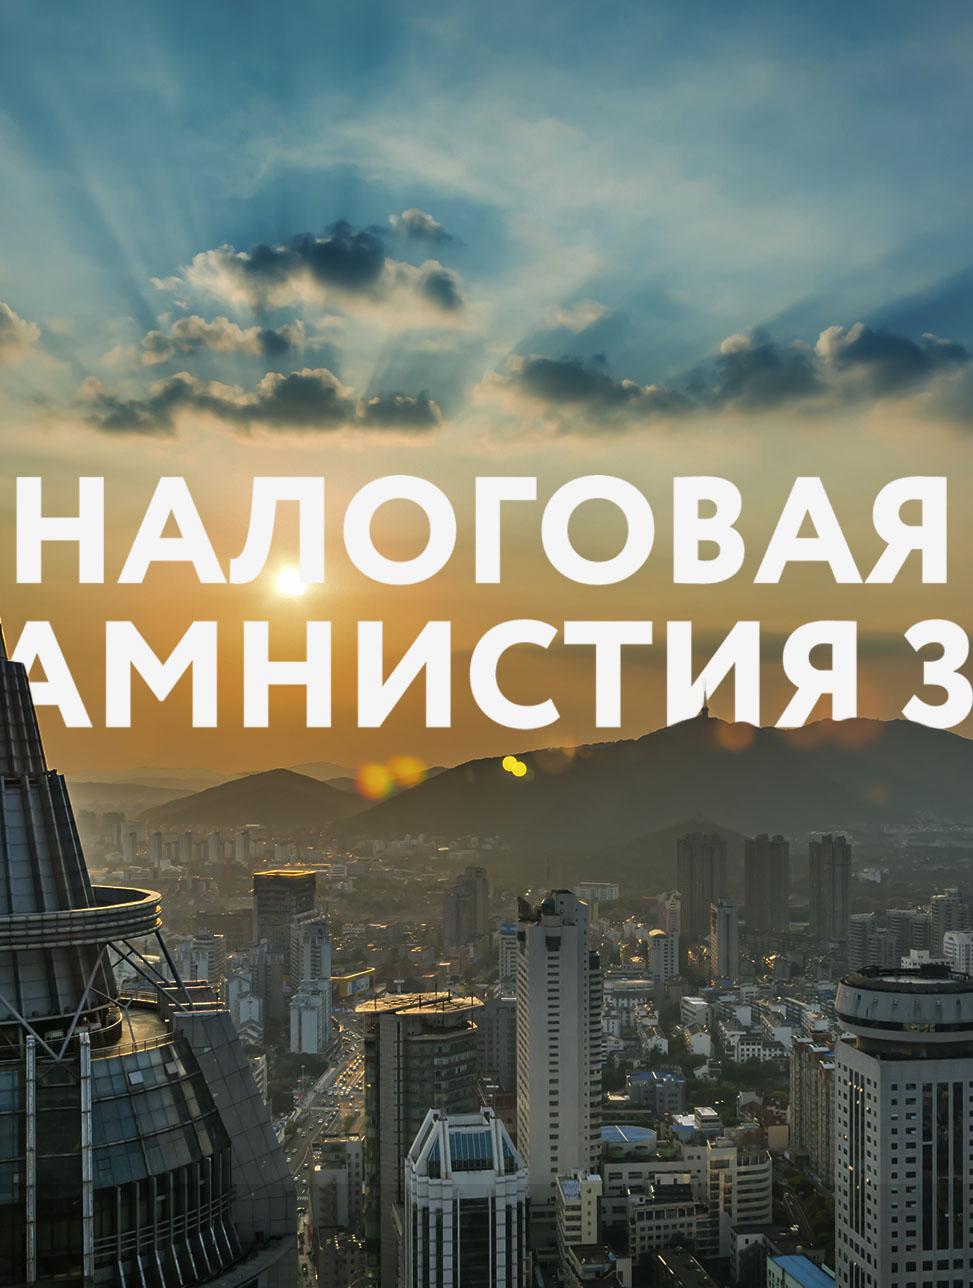 Амнистия 3 - BG 1 v3 mobile